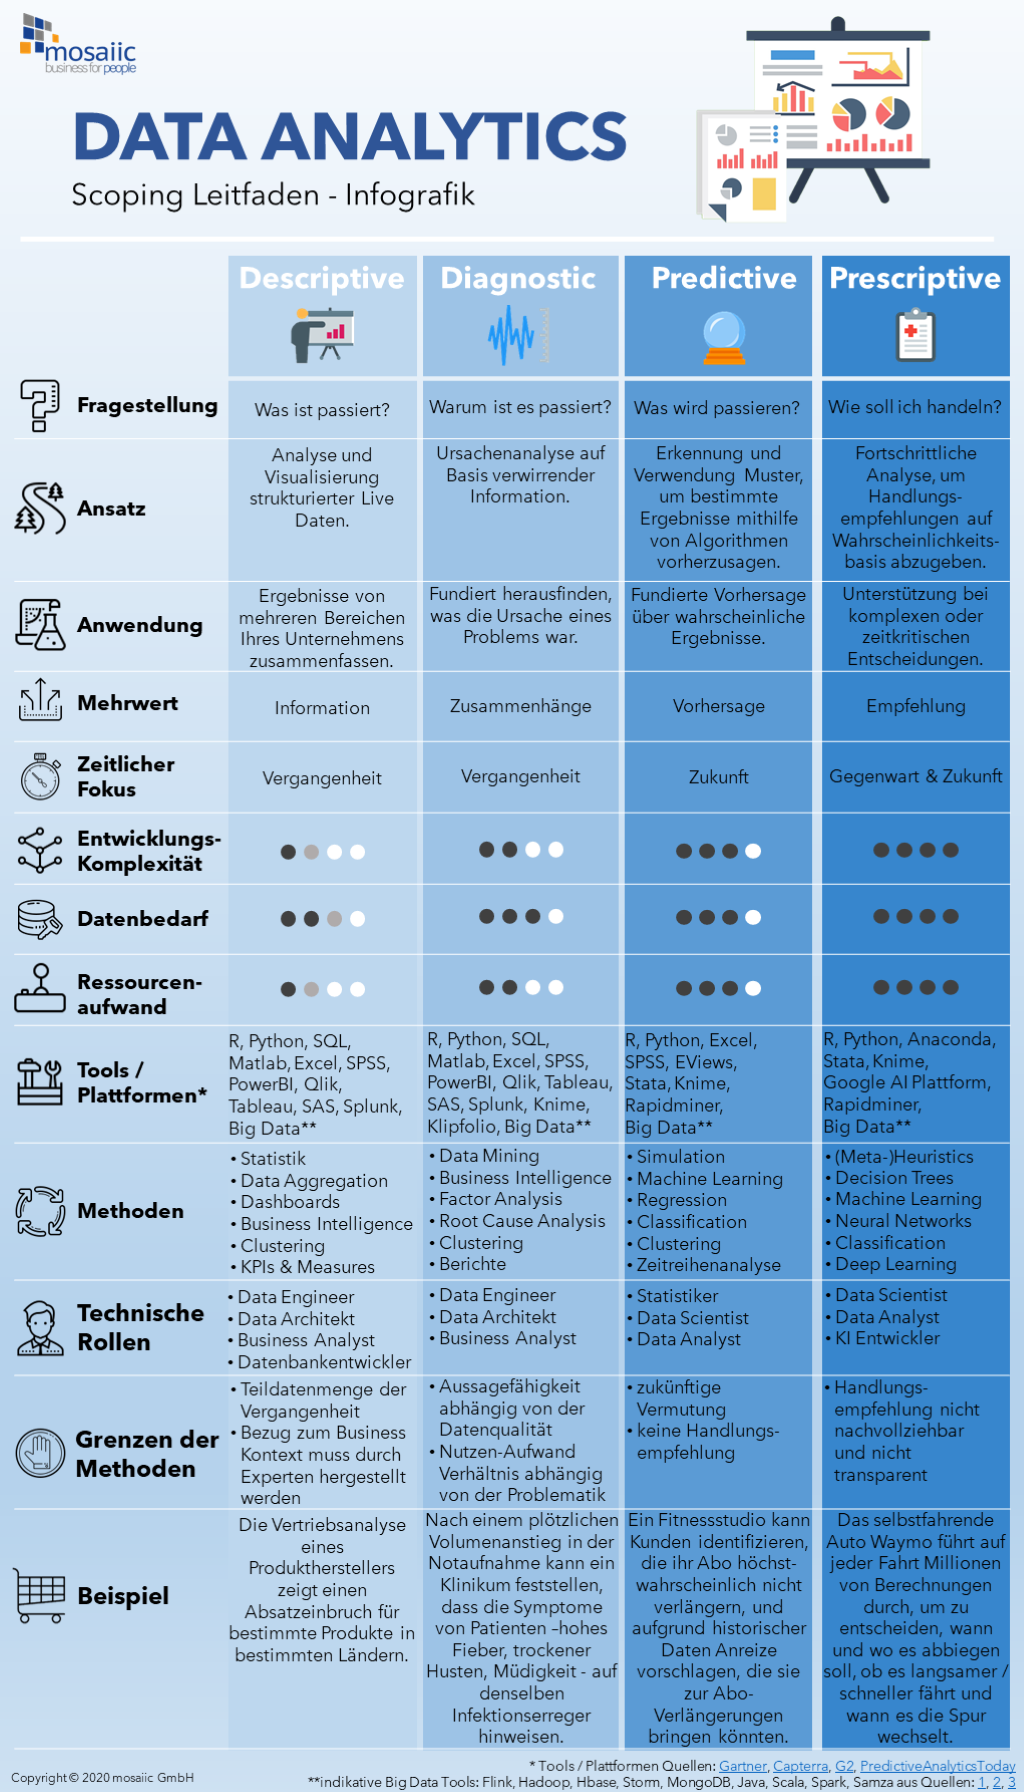 Data Analytics Scoping Leitfaden_Infografik